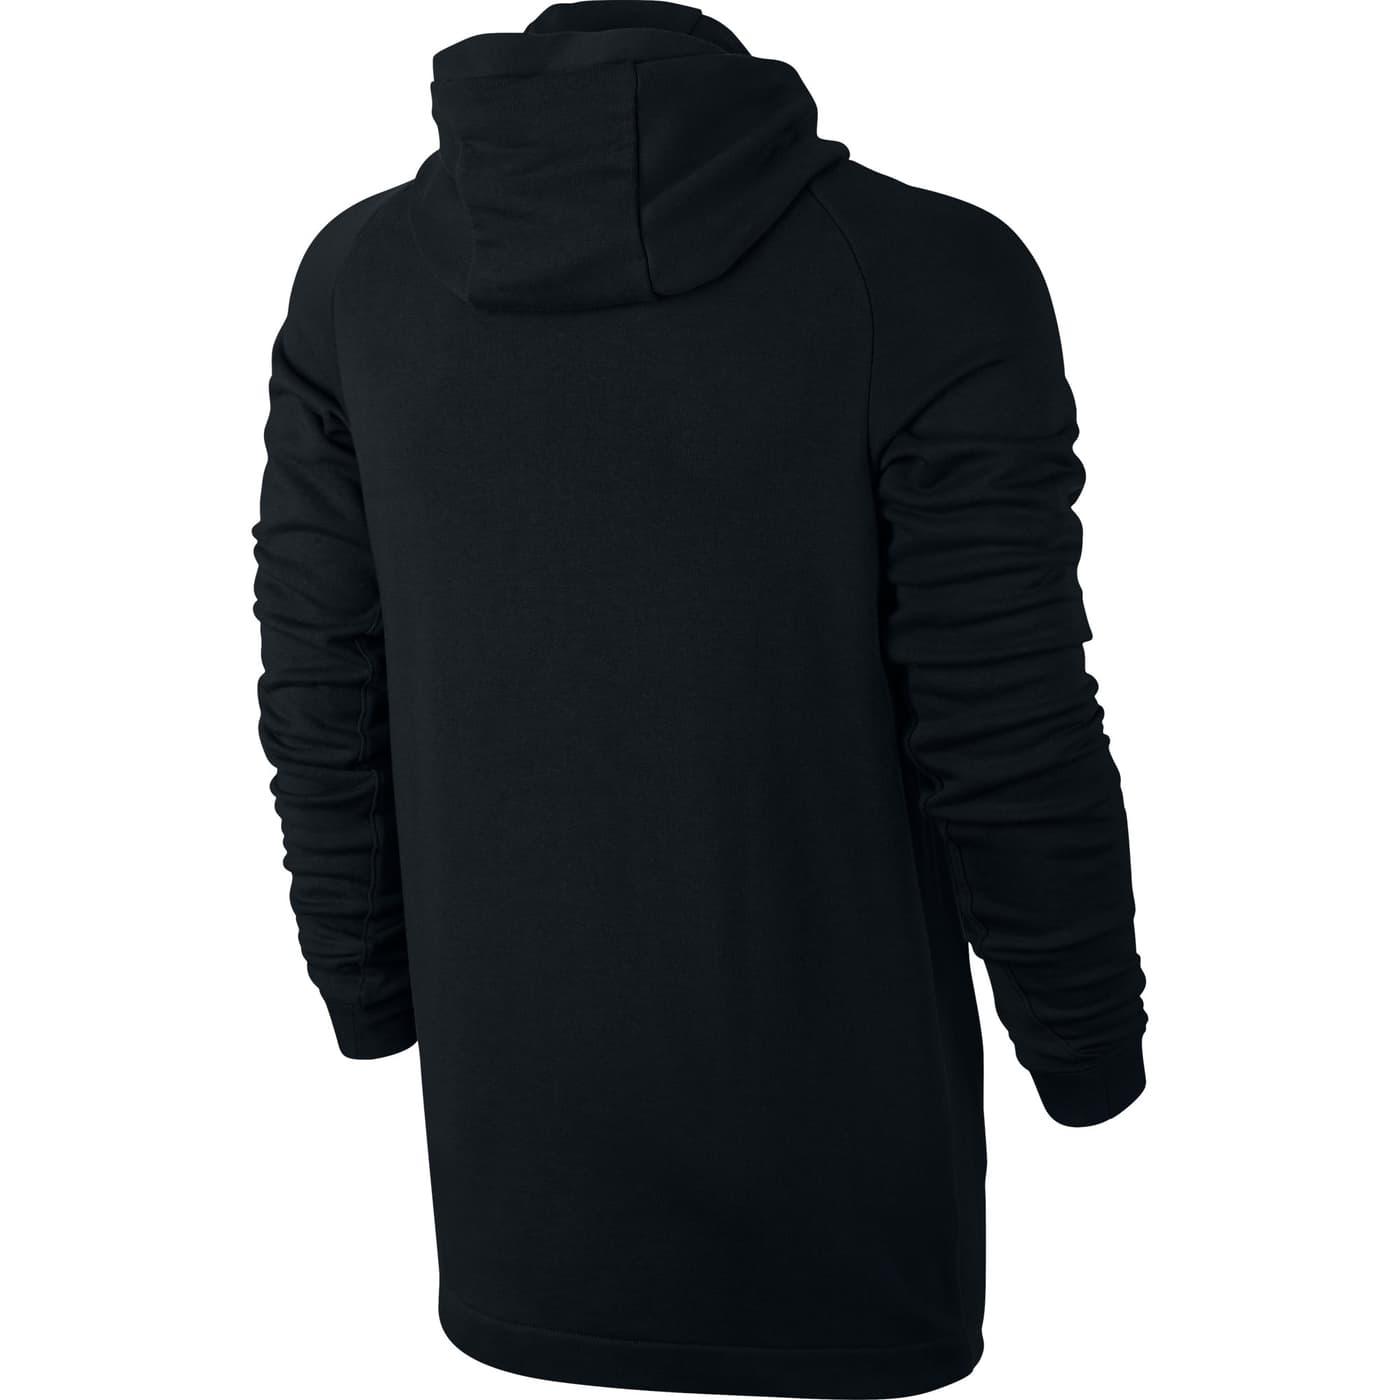 f7a5d1c54e956 ... Nike Sportswear Modern Hoodie Veste à capuche pour homme